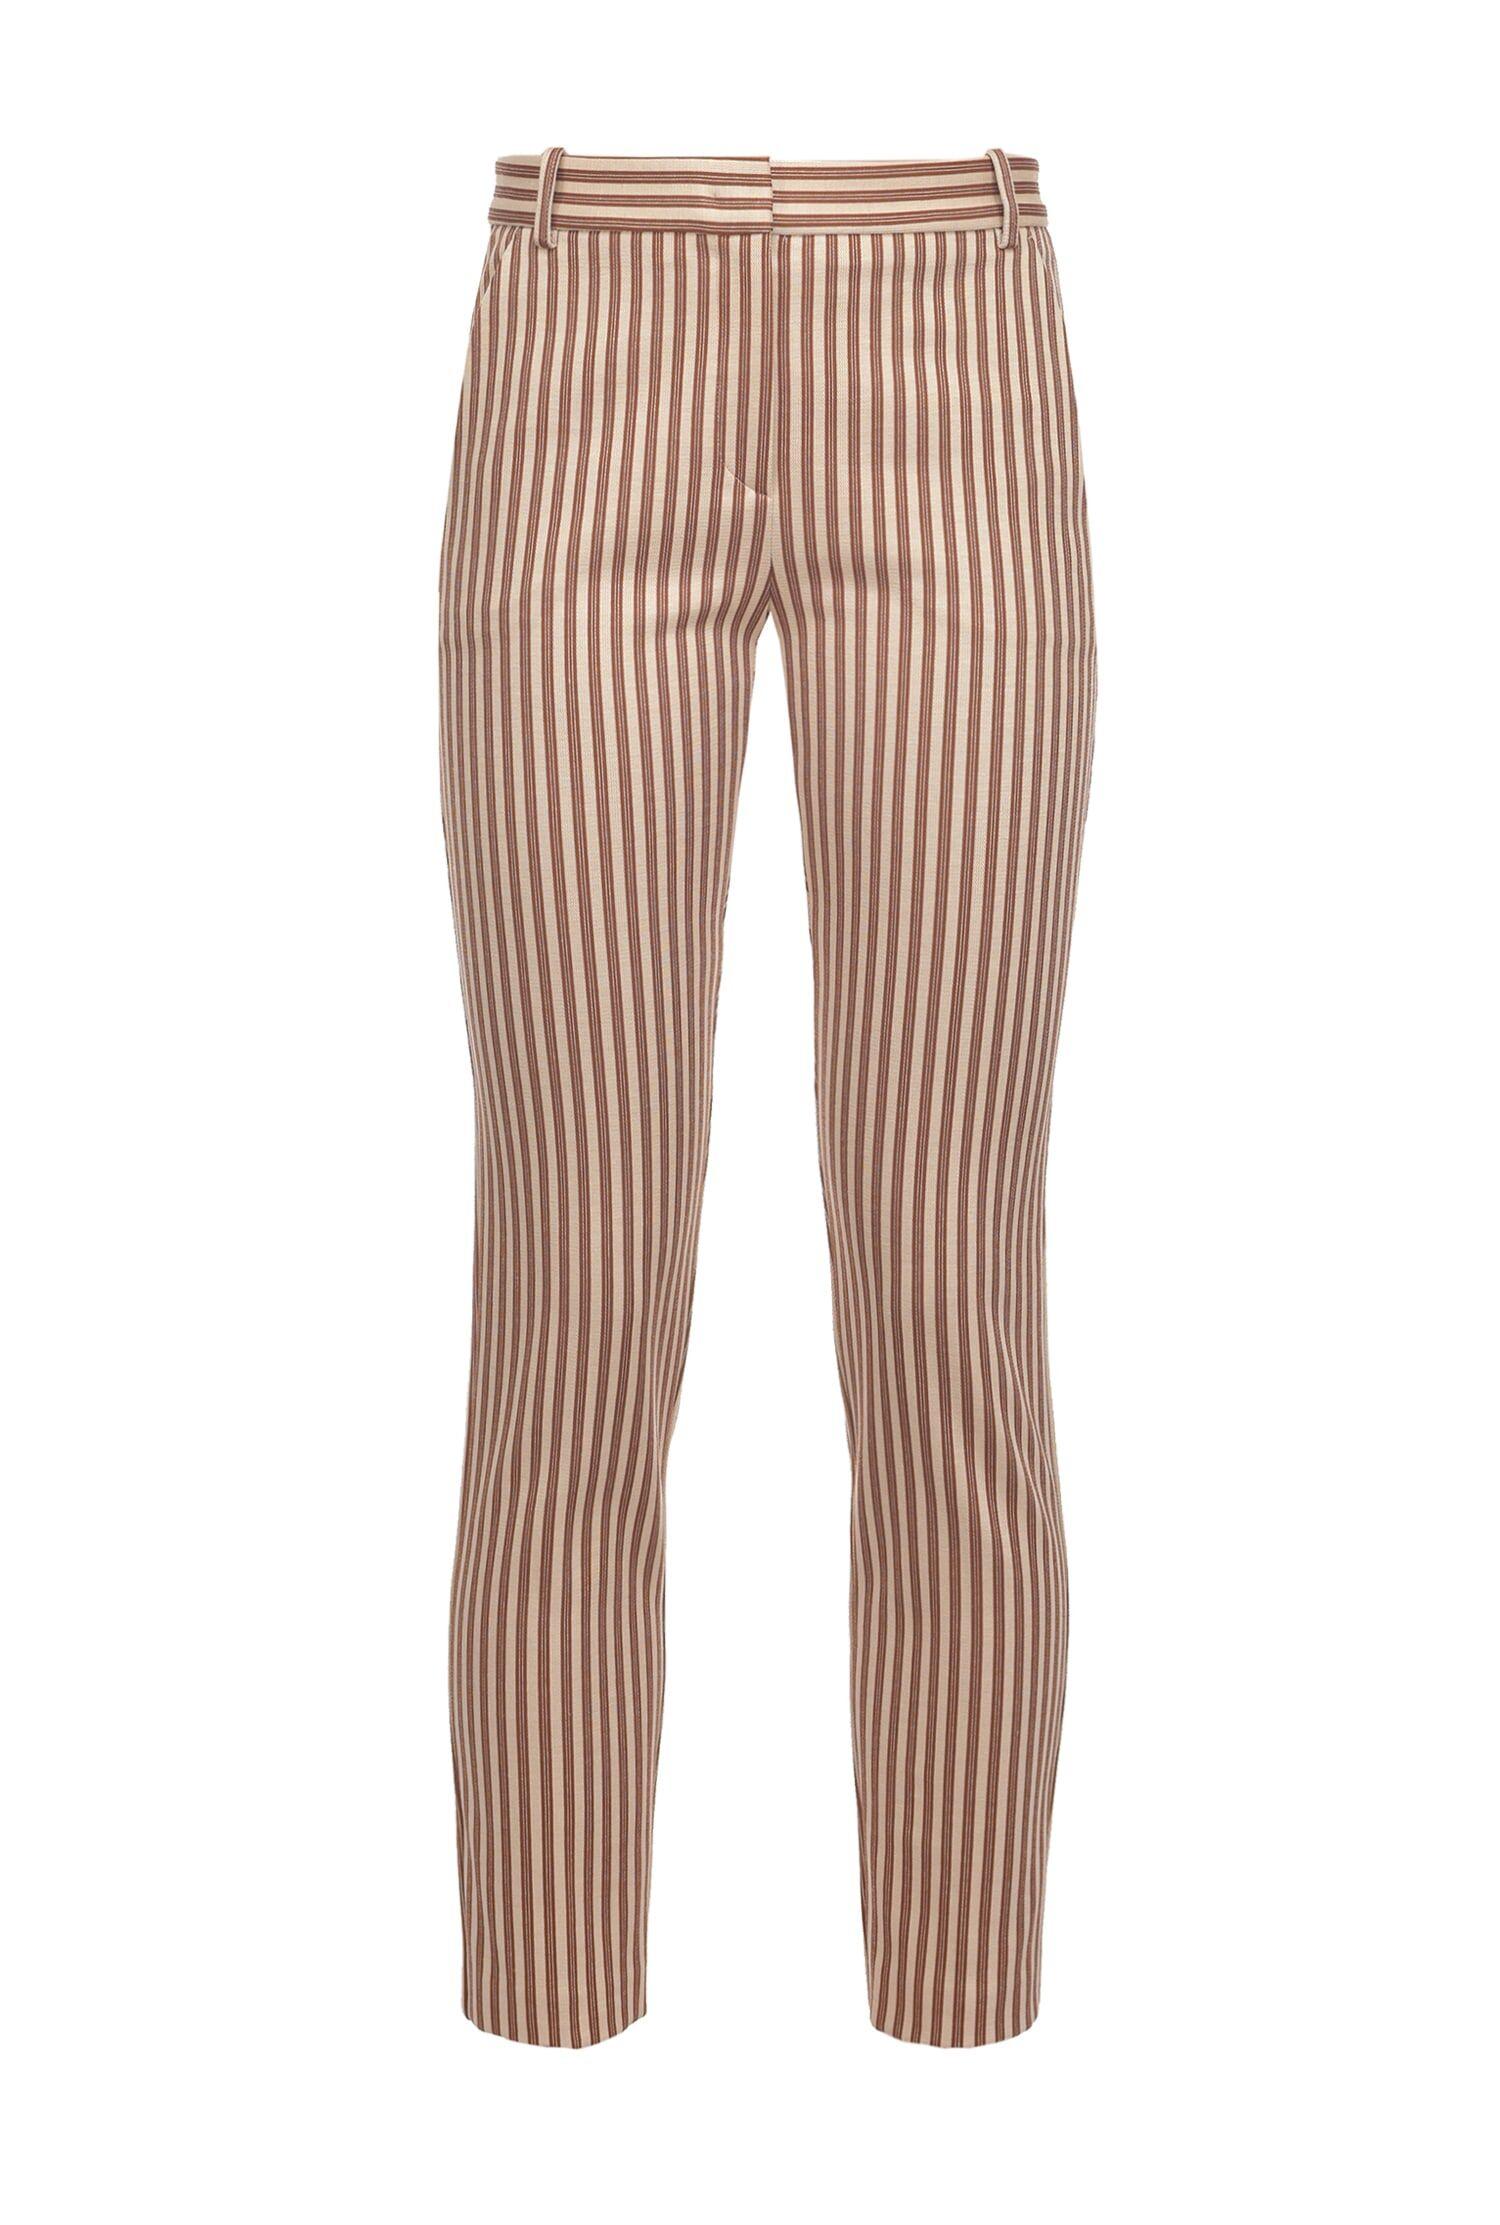 Striped Cigarette-Fit Pants - Pinko